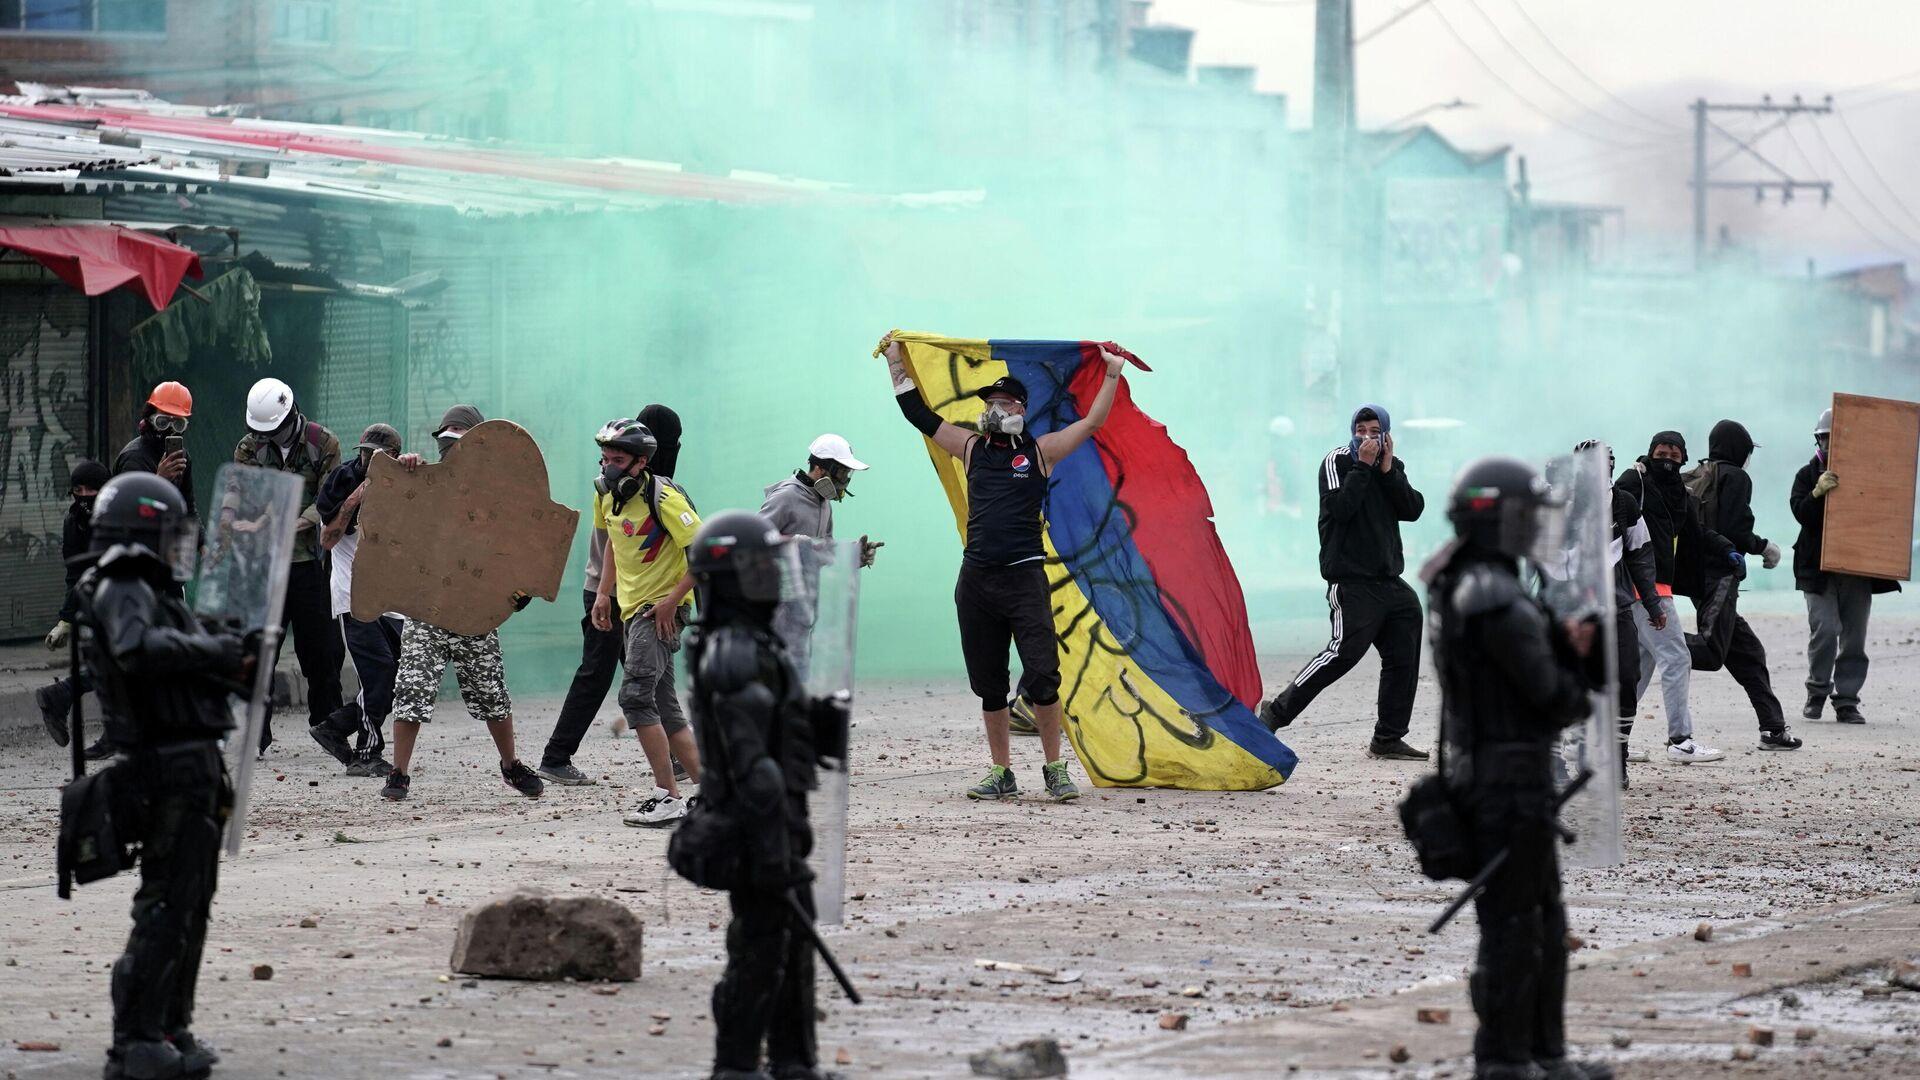 Protestas en Bogotá, Colombia - Sputnik Mundo, 1920, 29.07.2021